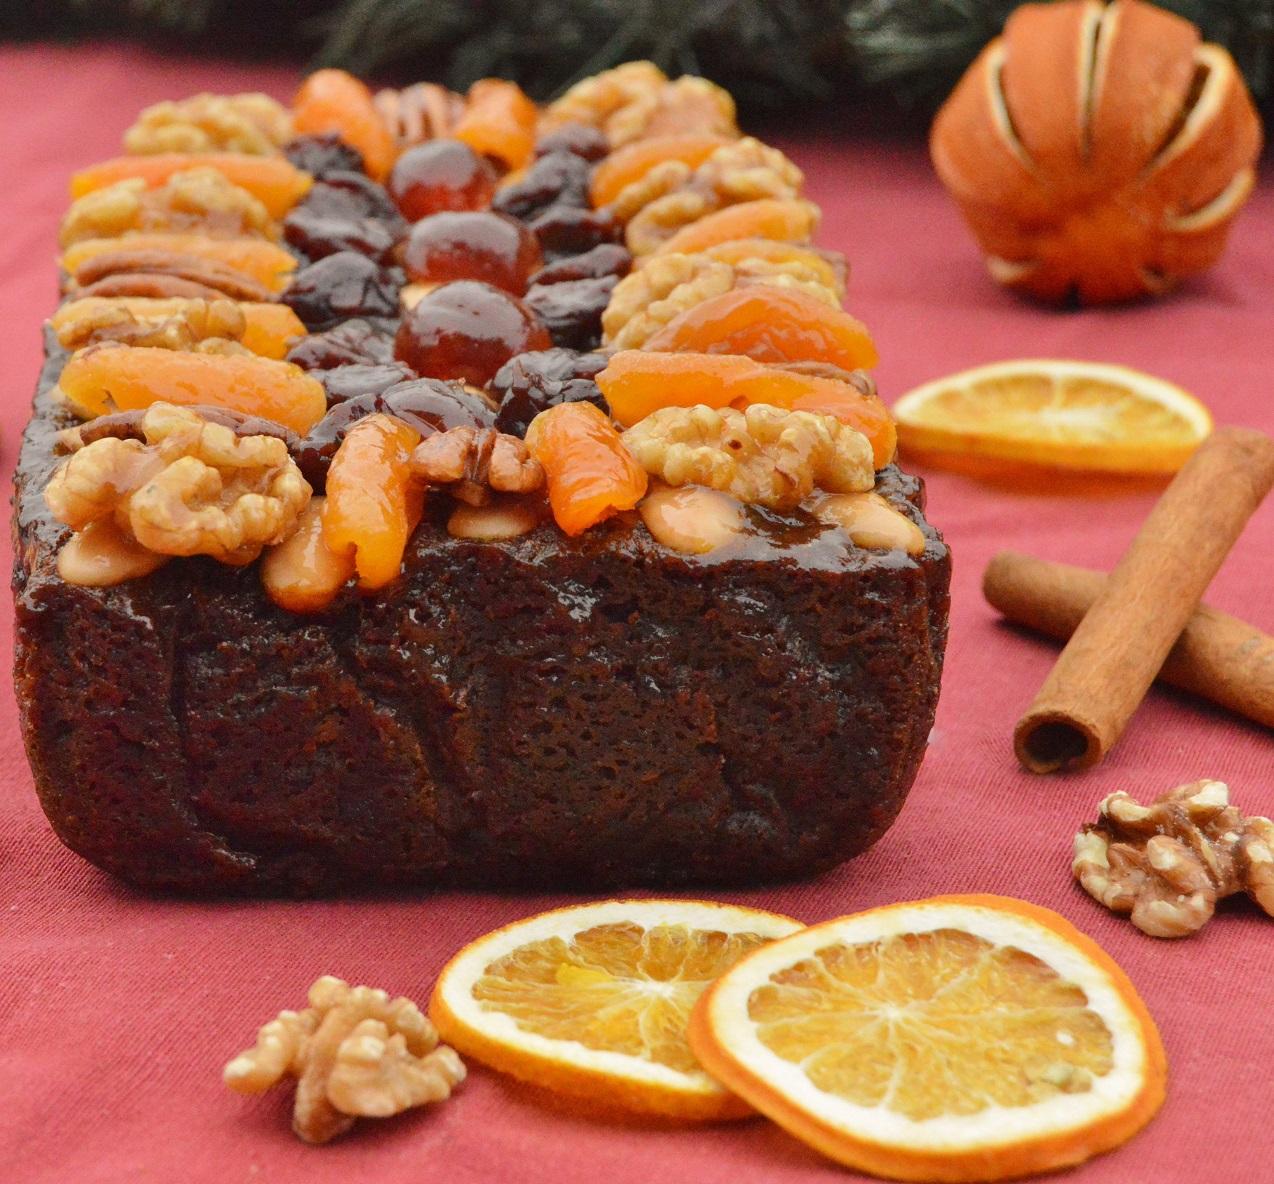 Glazed Fruit & Nut Vegan Christmas Cake